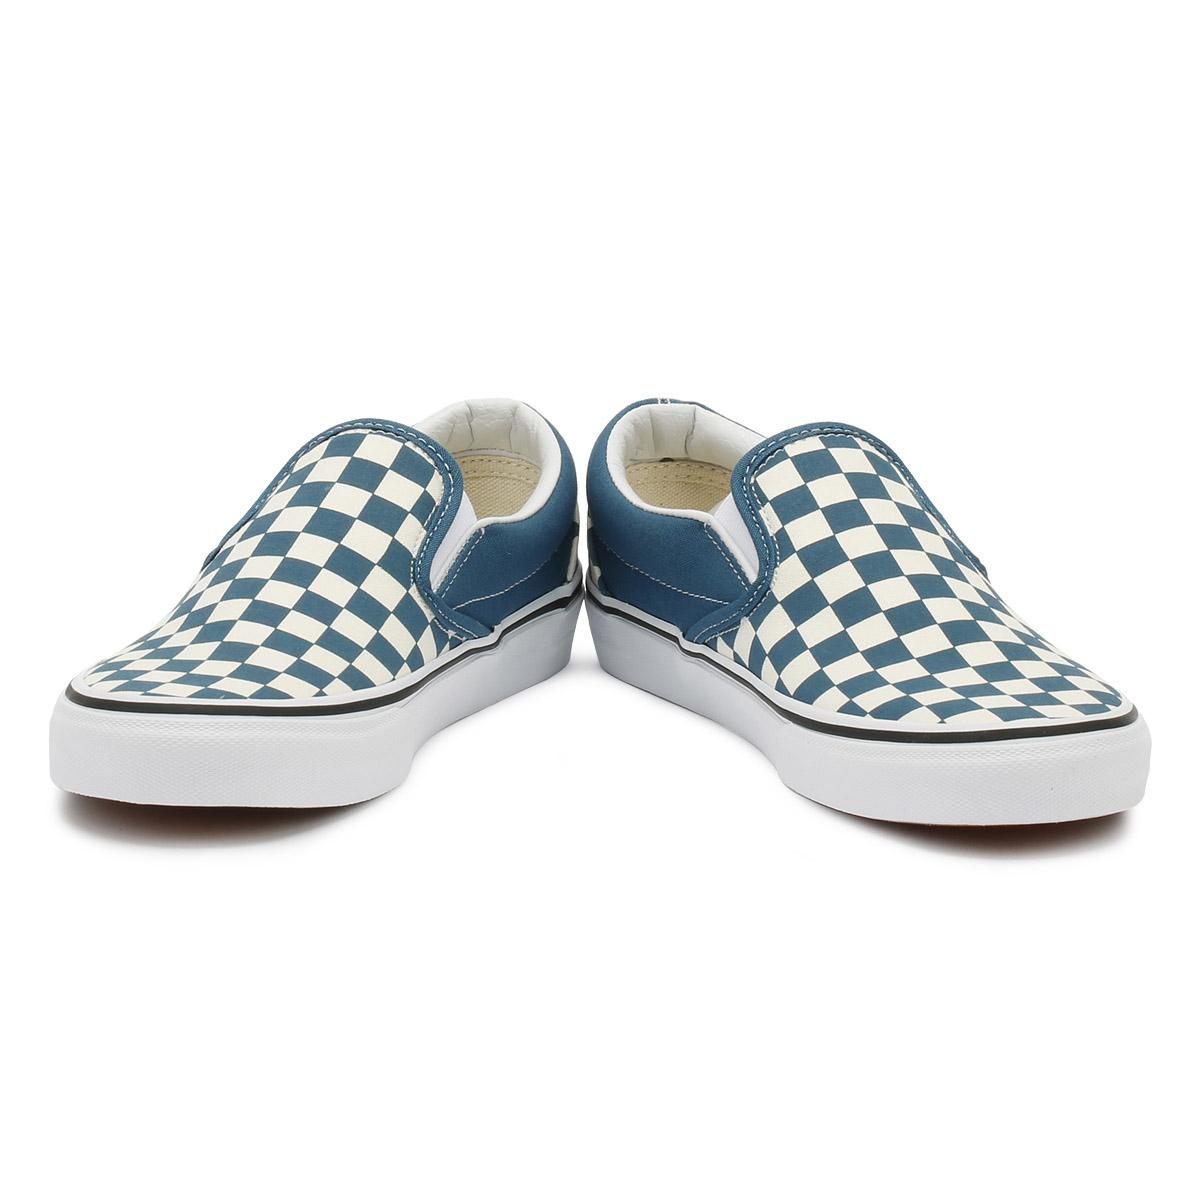 3e022350922 Vans Unisex Trainers Corsair   True White Checkerboard Classic Slip On Shoes